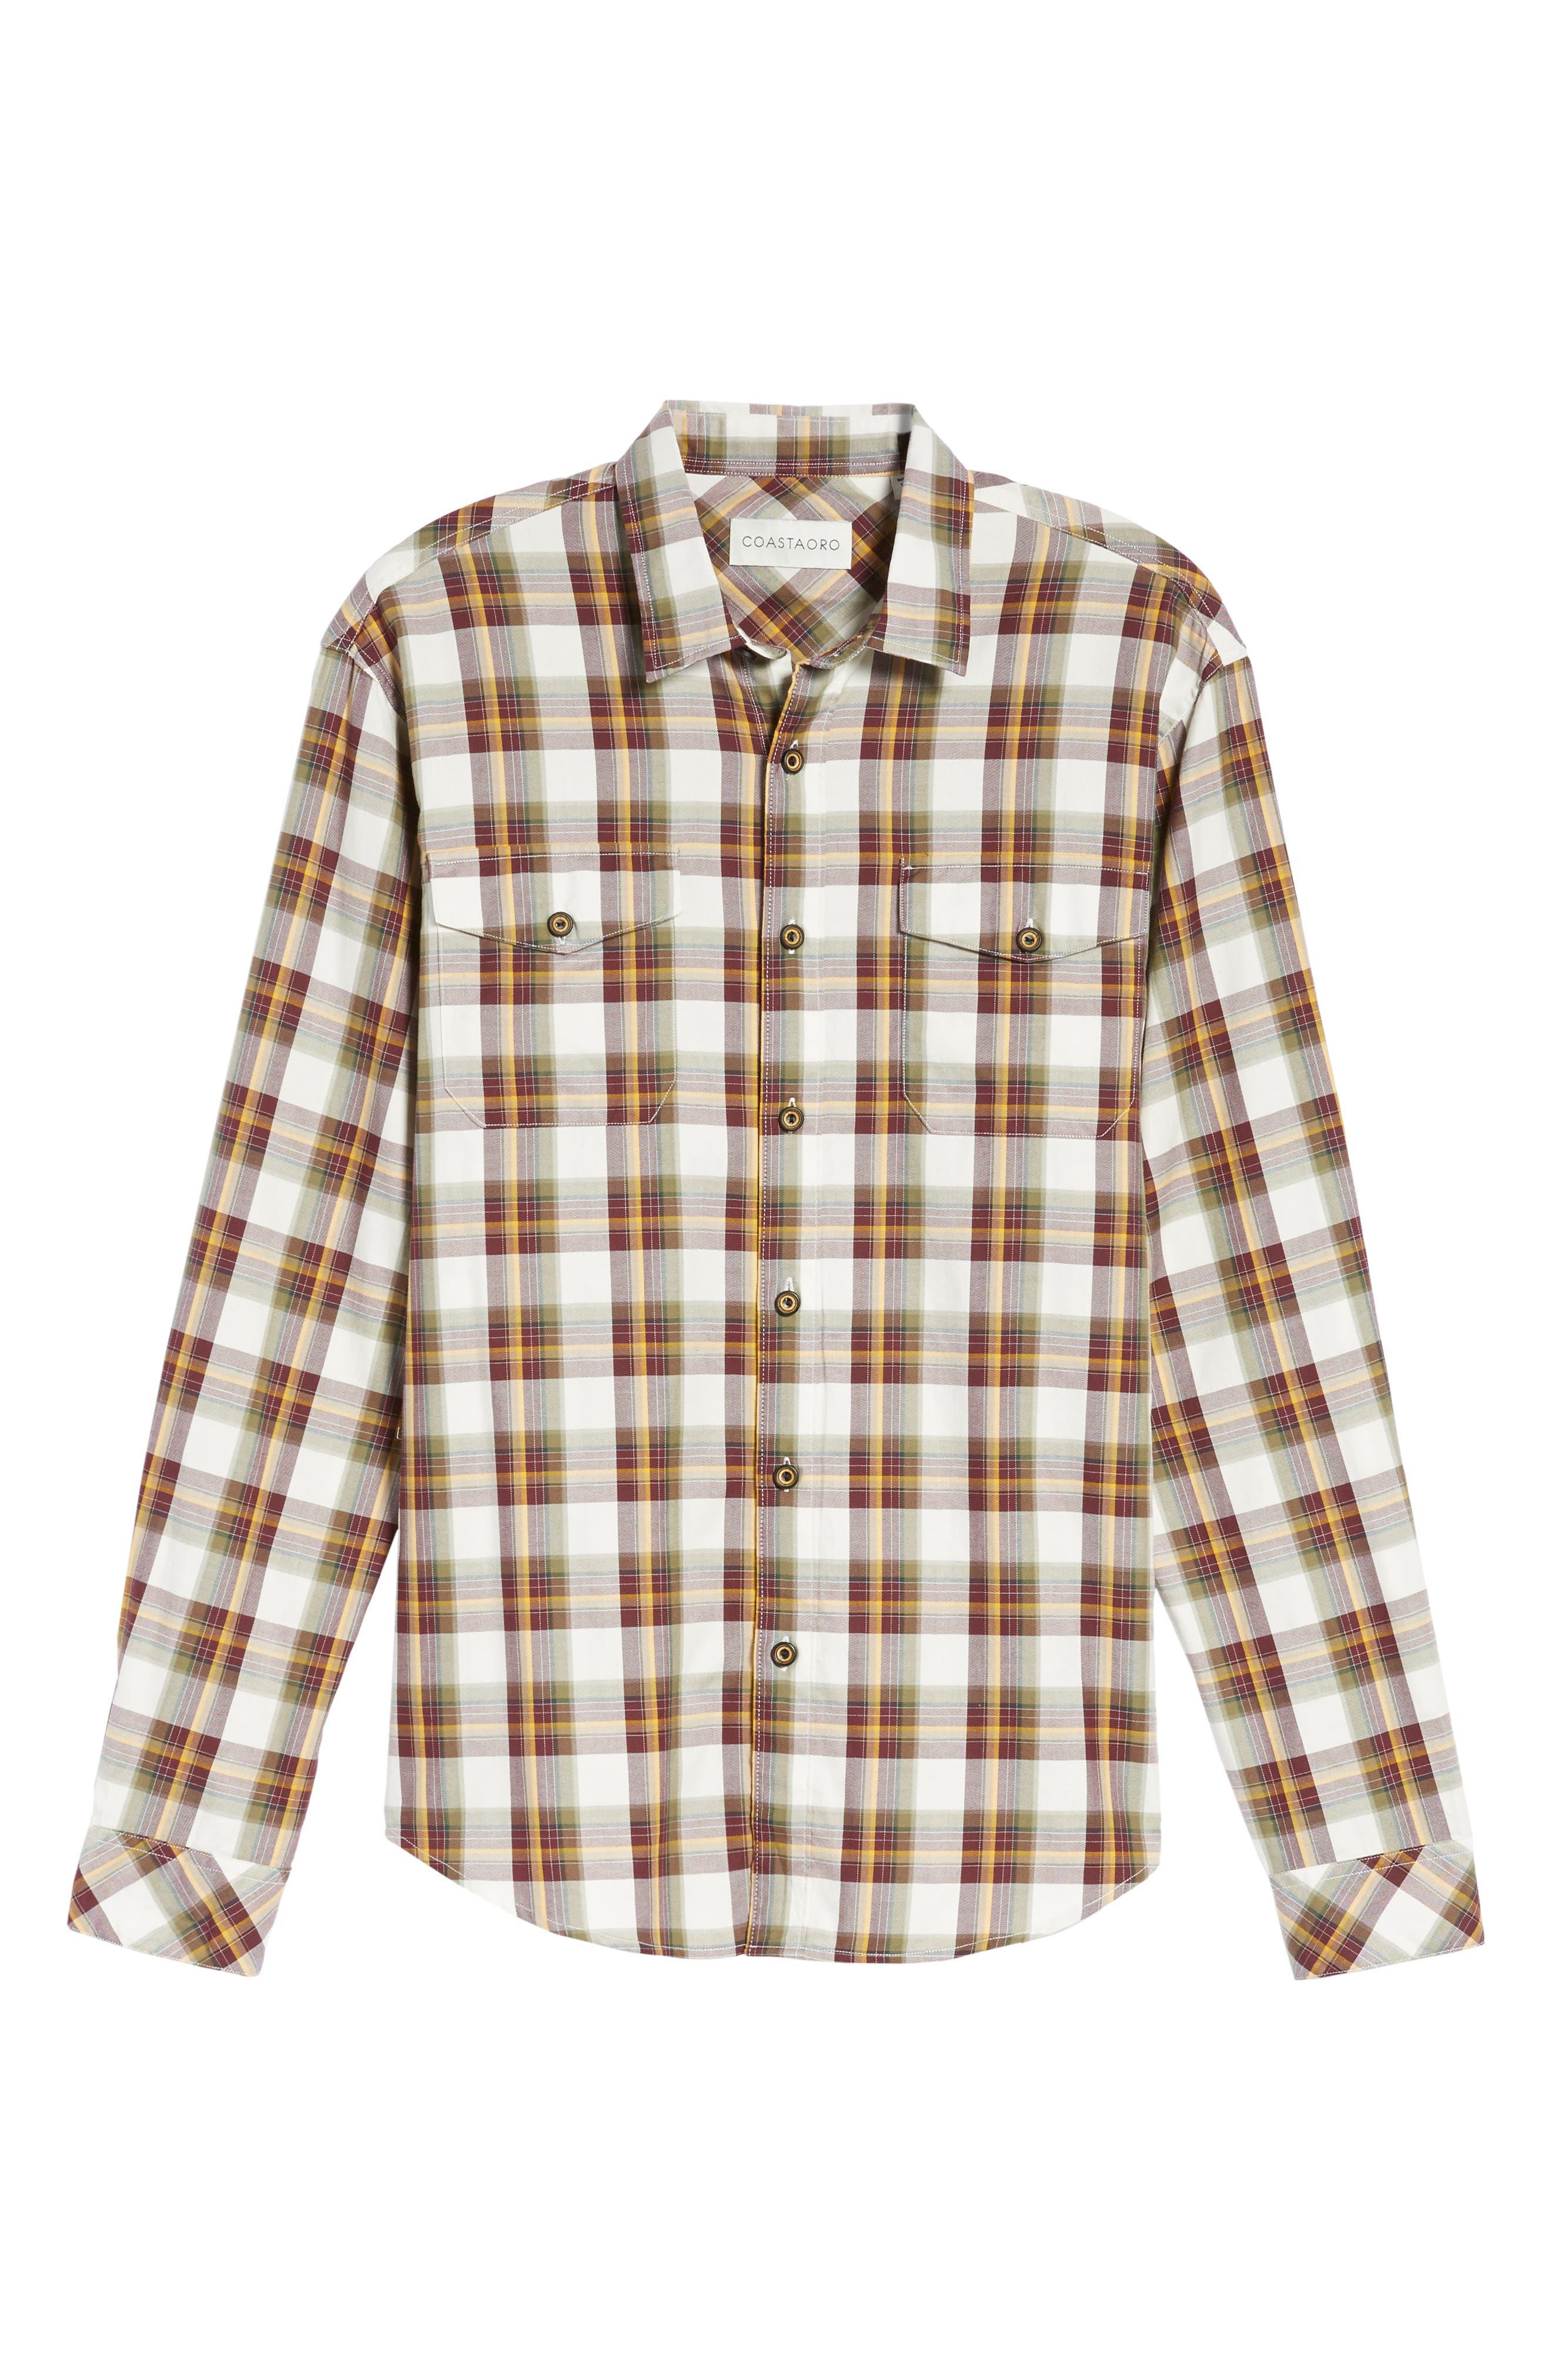 Seacliff Plaid Flannel Shirt,                             Alternate thumbnail 6, color,                             Merlot